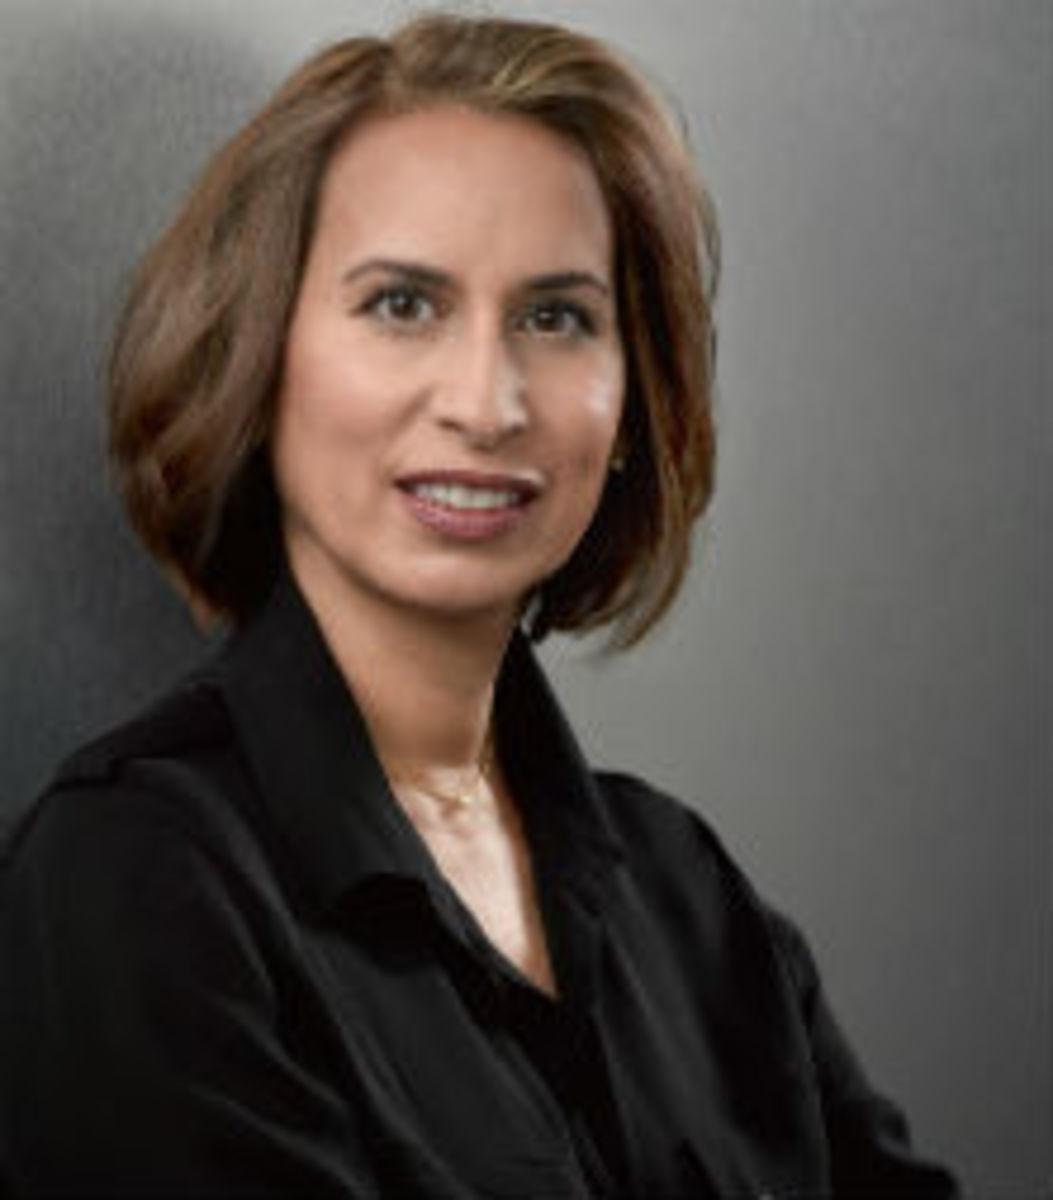 Michele_Campbell_CREDIT Sigrid Estrada Featured